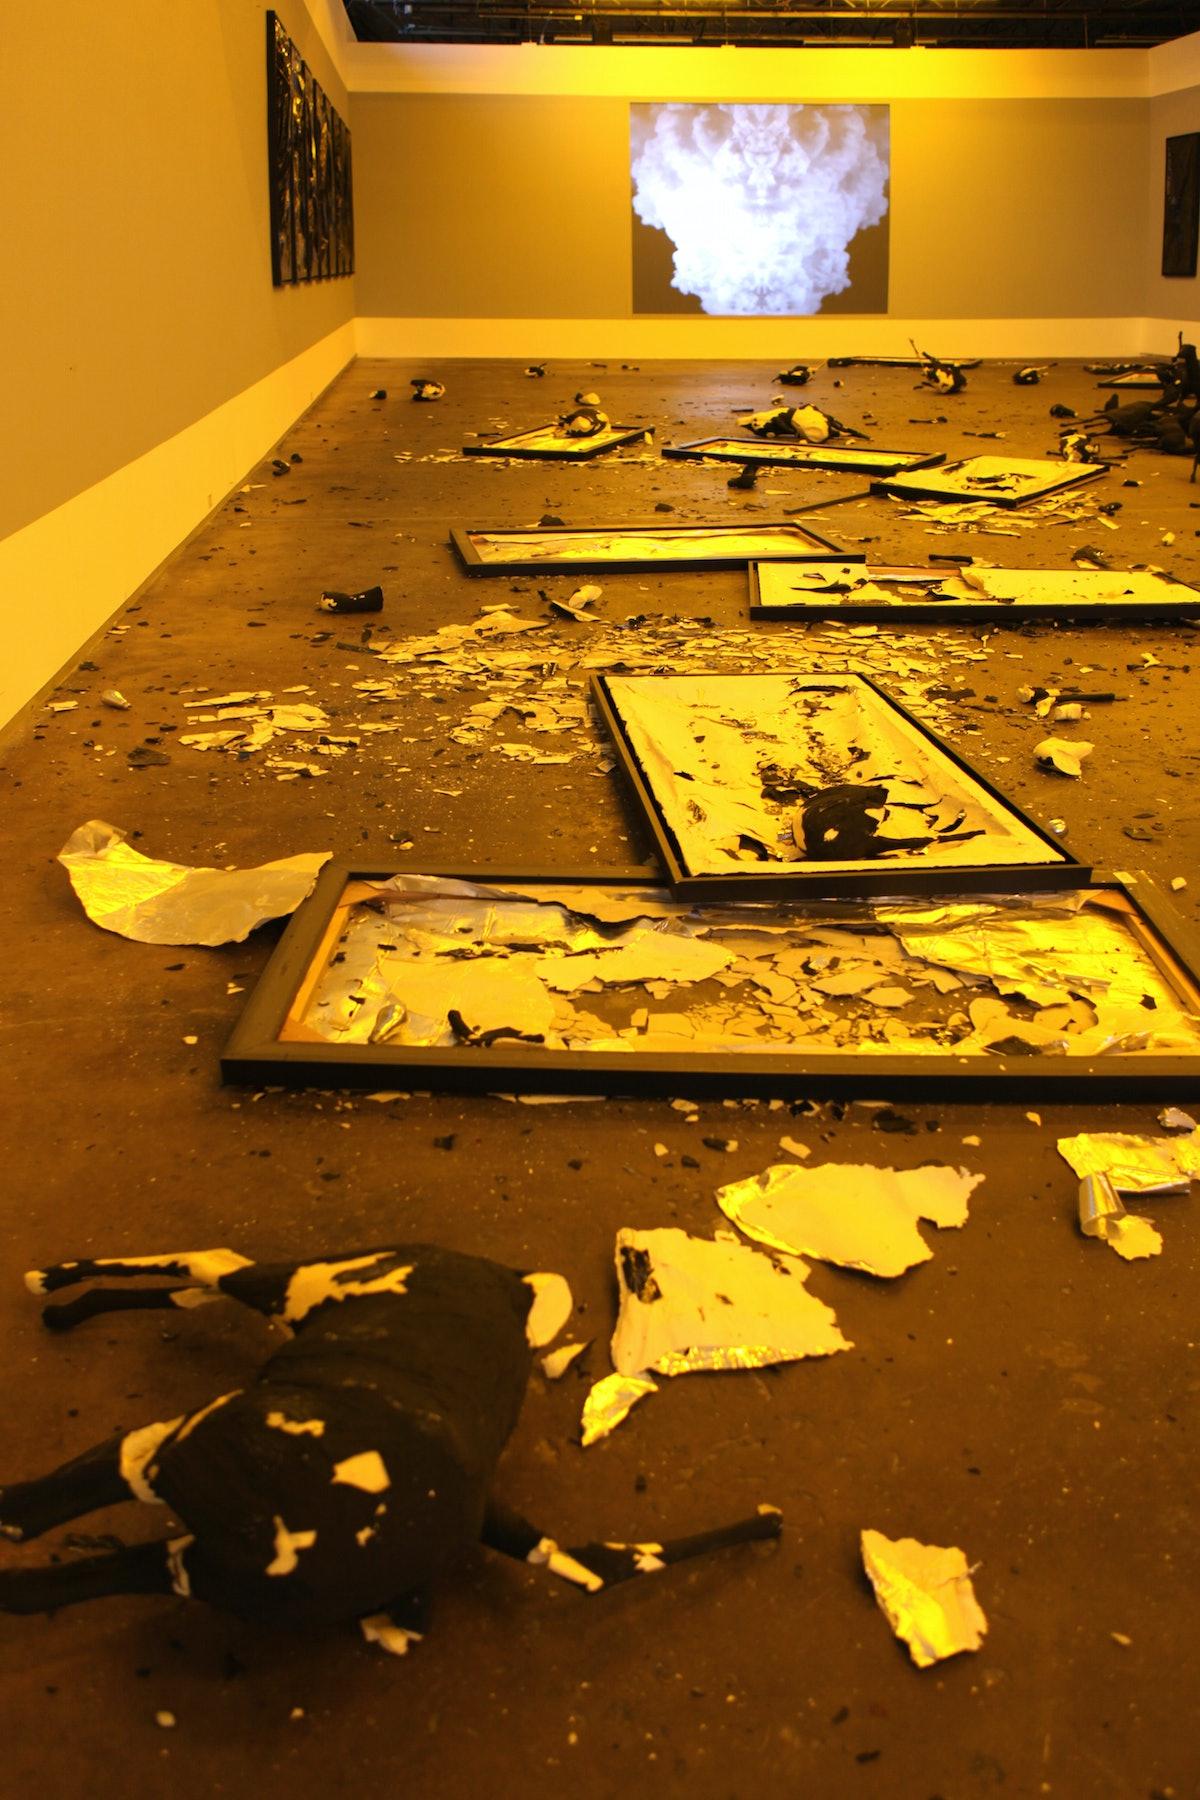 Loris Gréaud at the Dallas Contemporary